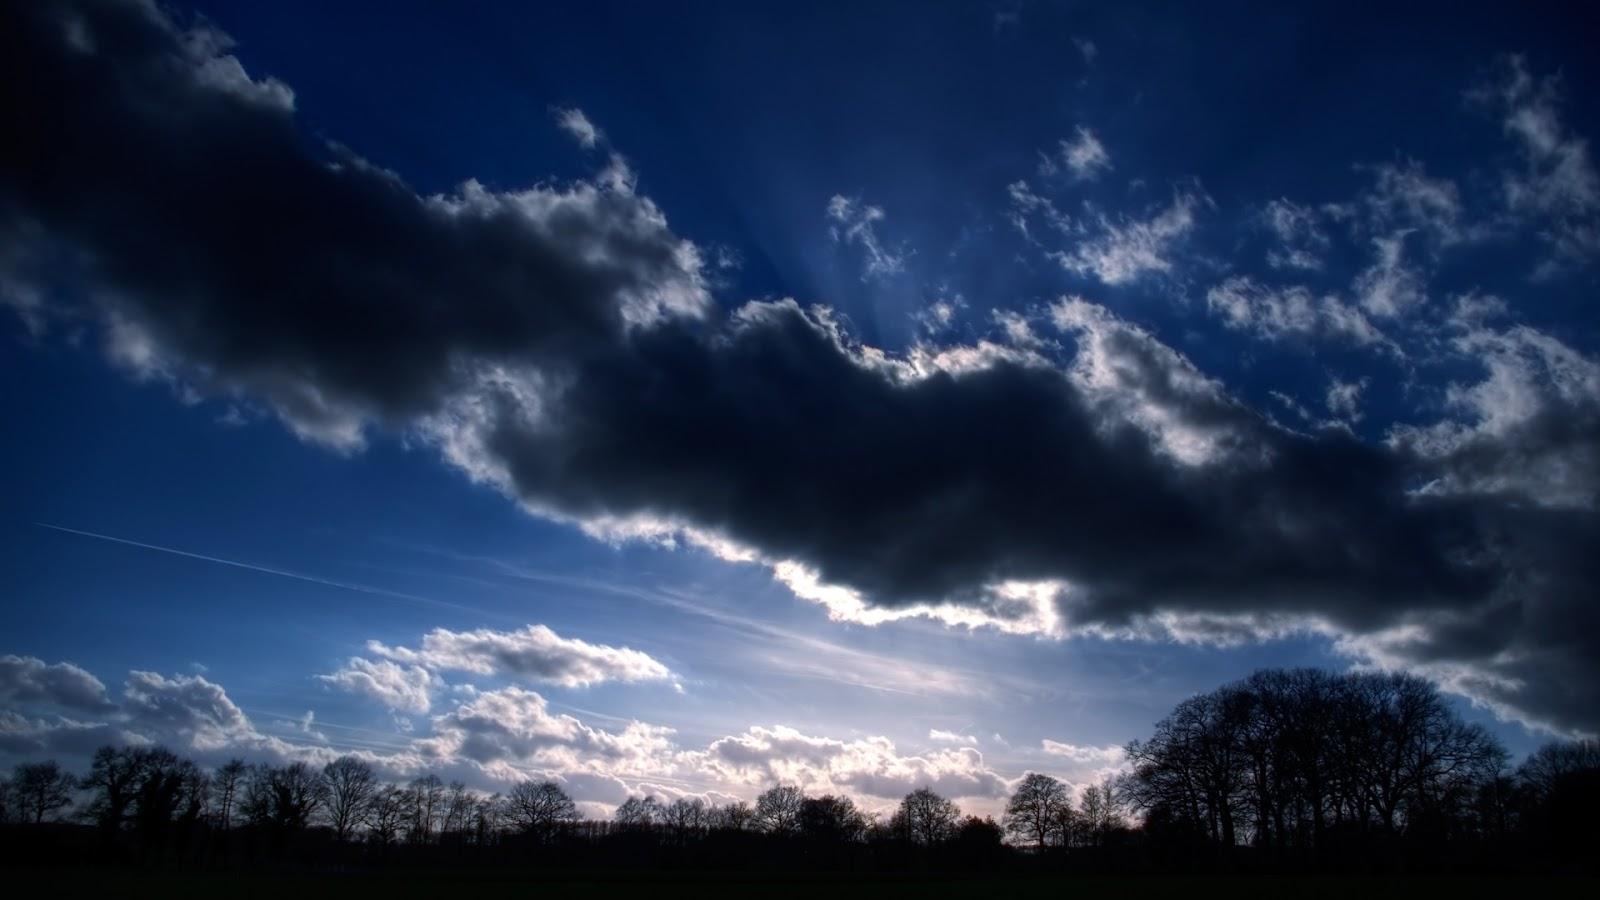 Dark Blue Sky Background: Full HD Desktop Wallpapers 1080p